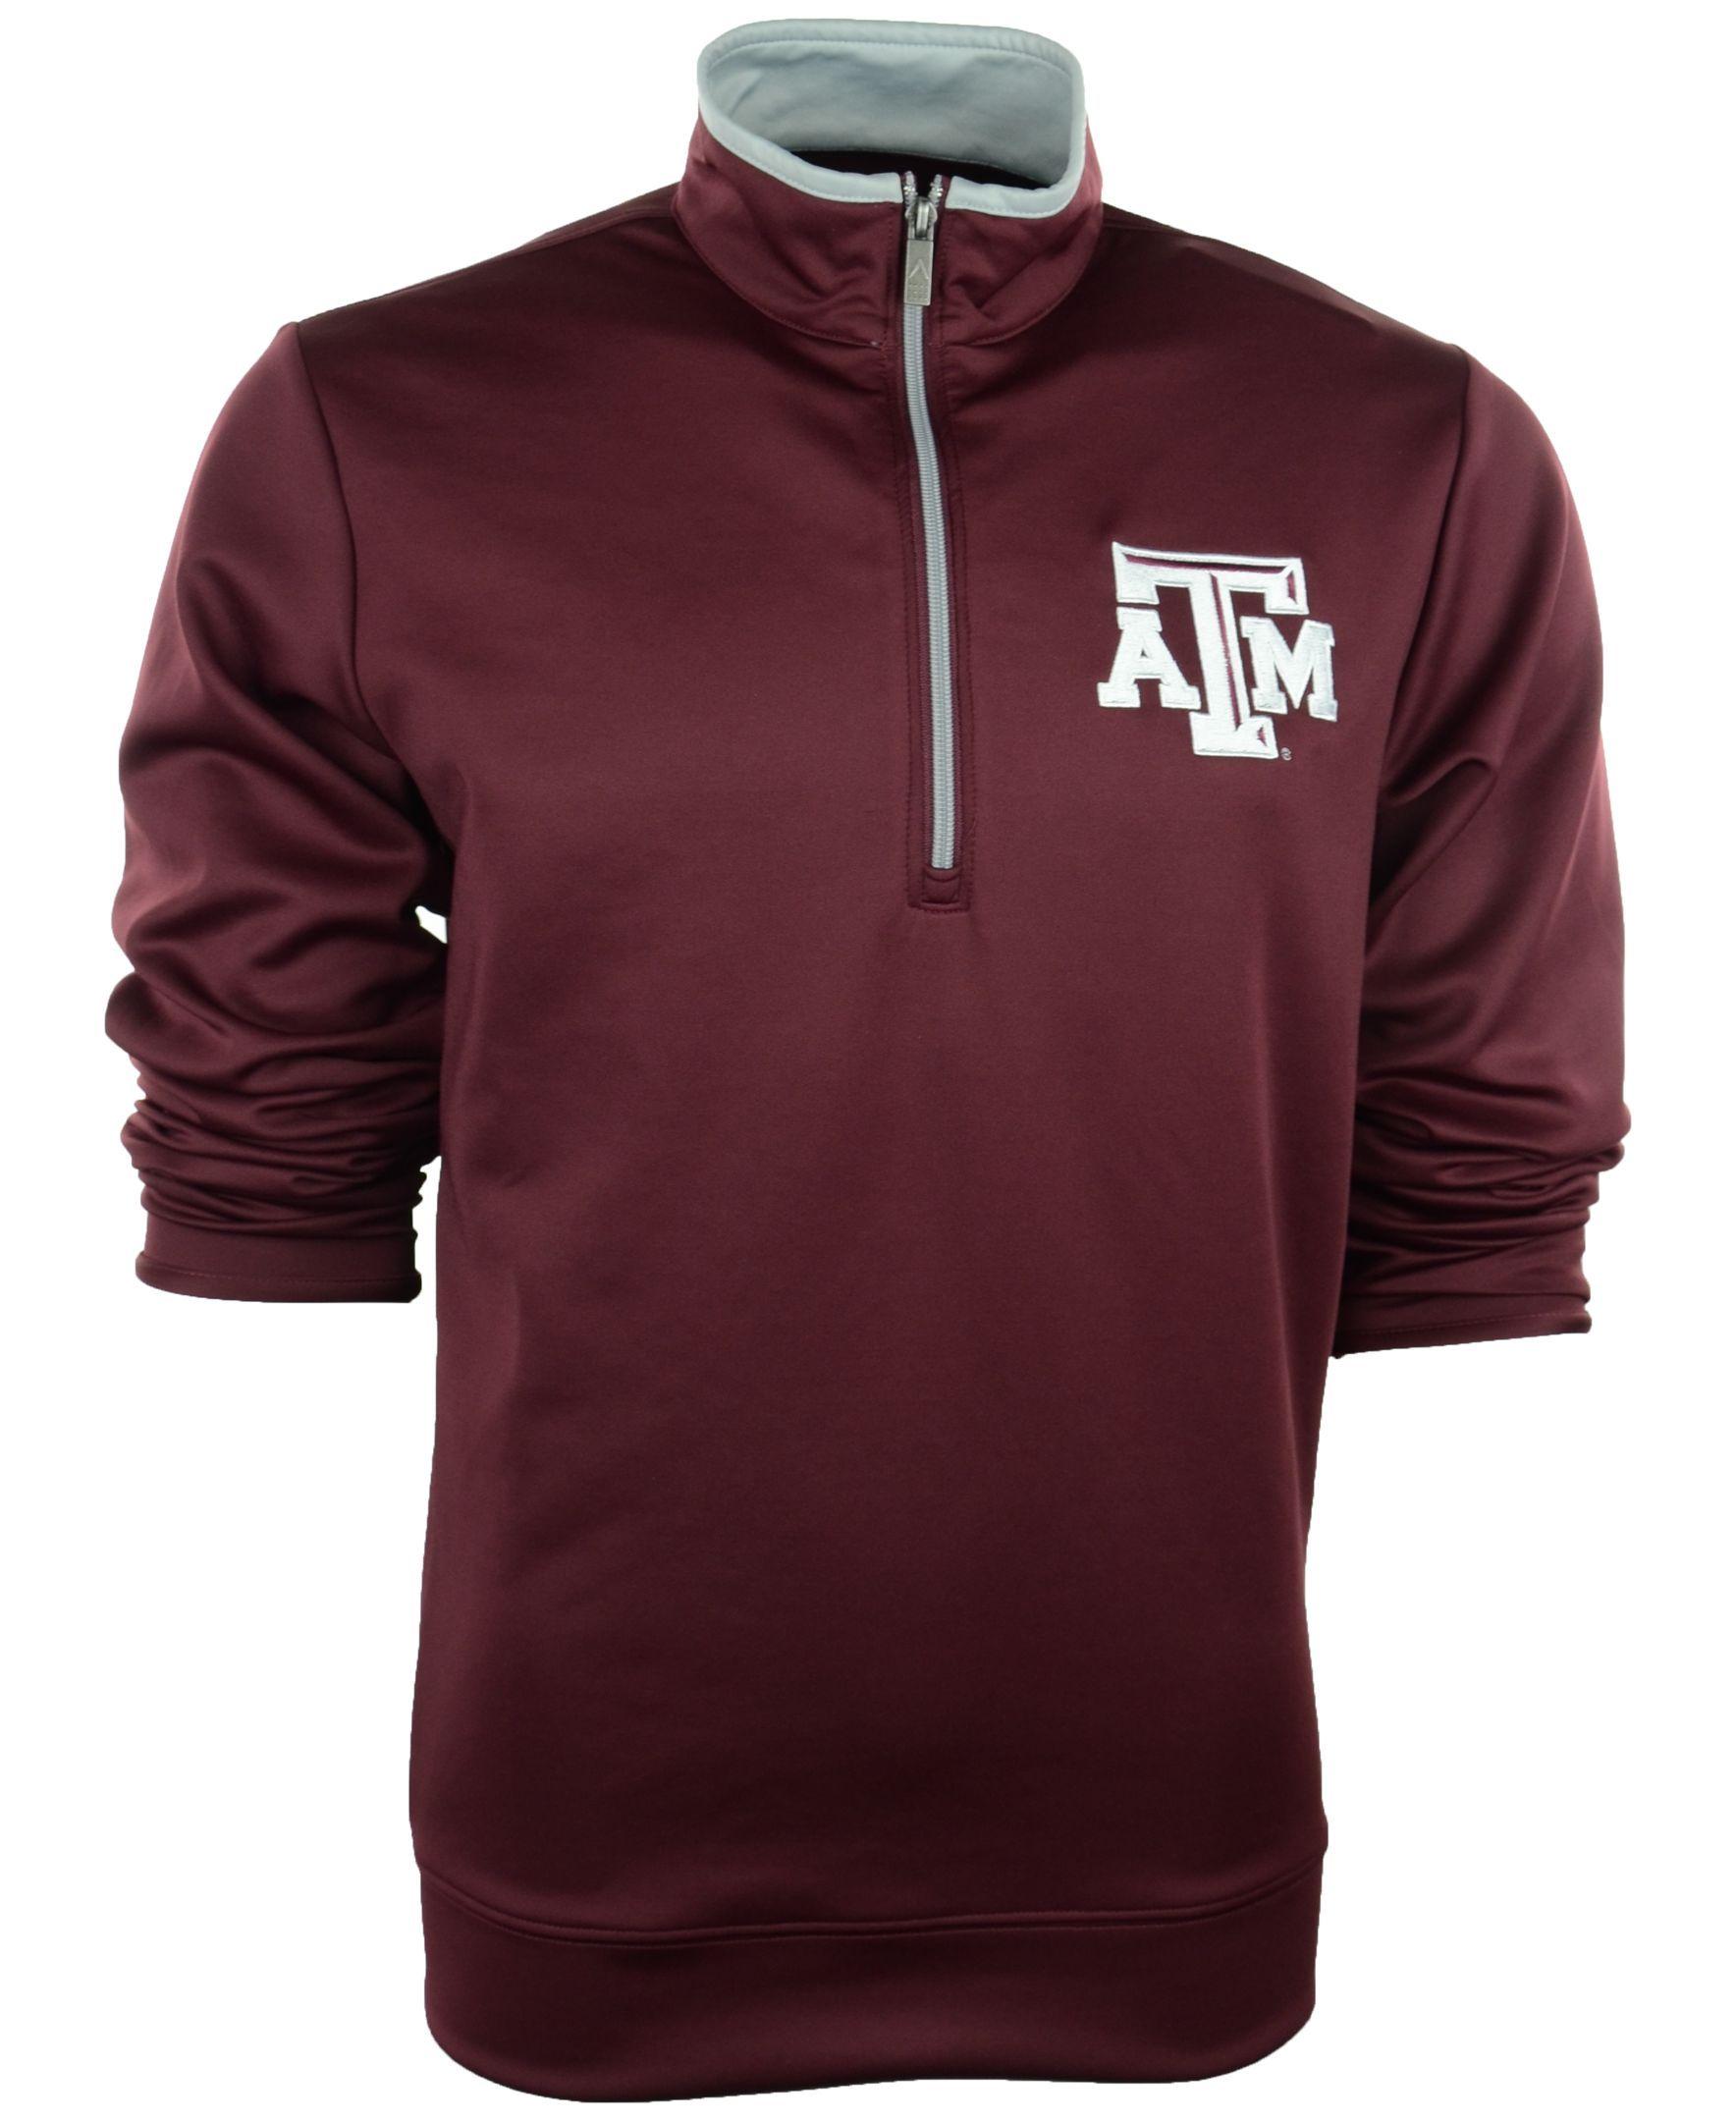 Antigua Men's Texas A&M Aggies Quarter-Zip Pullover